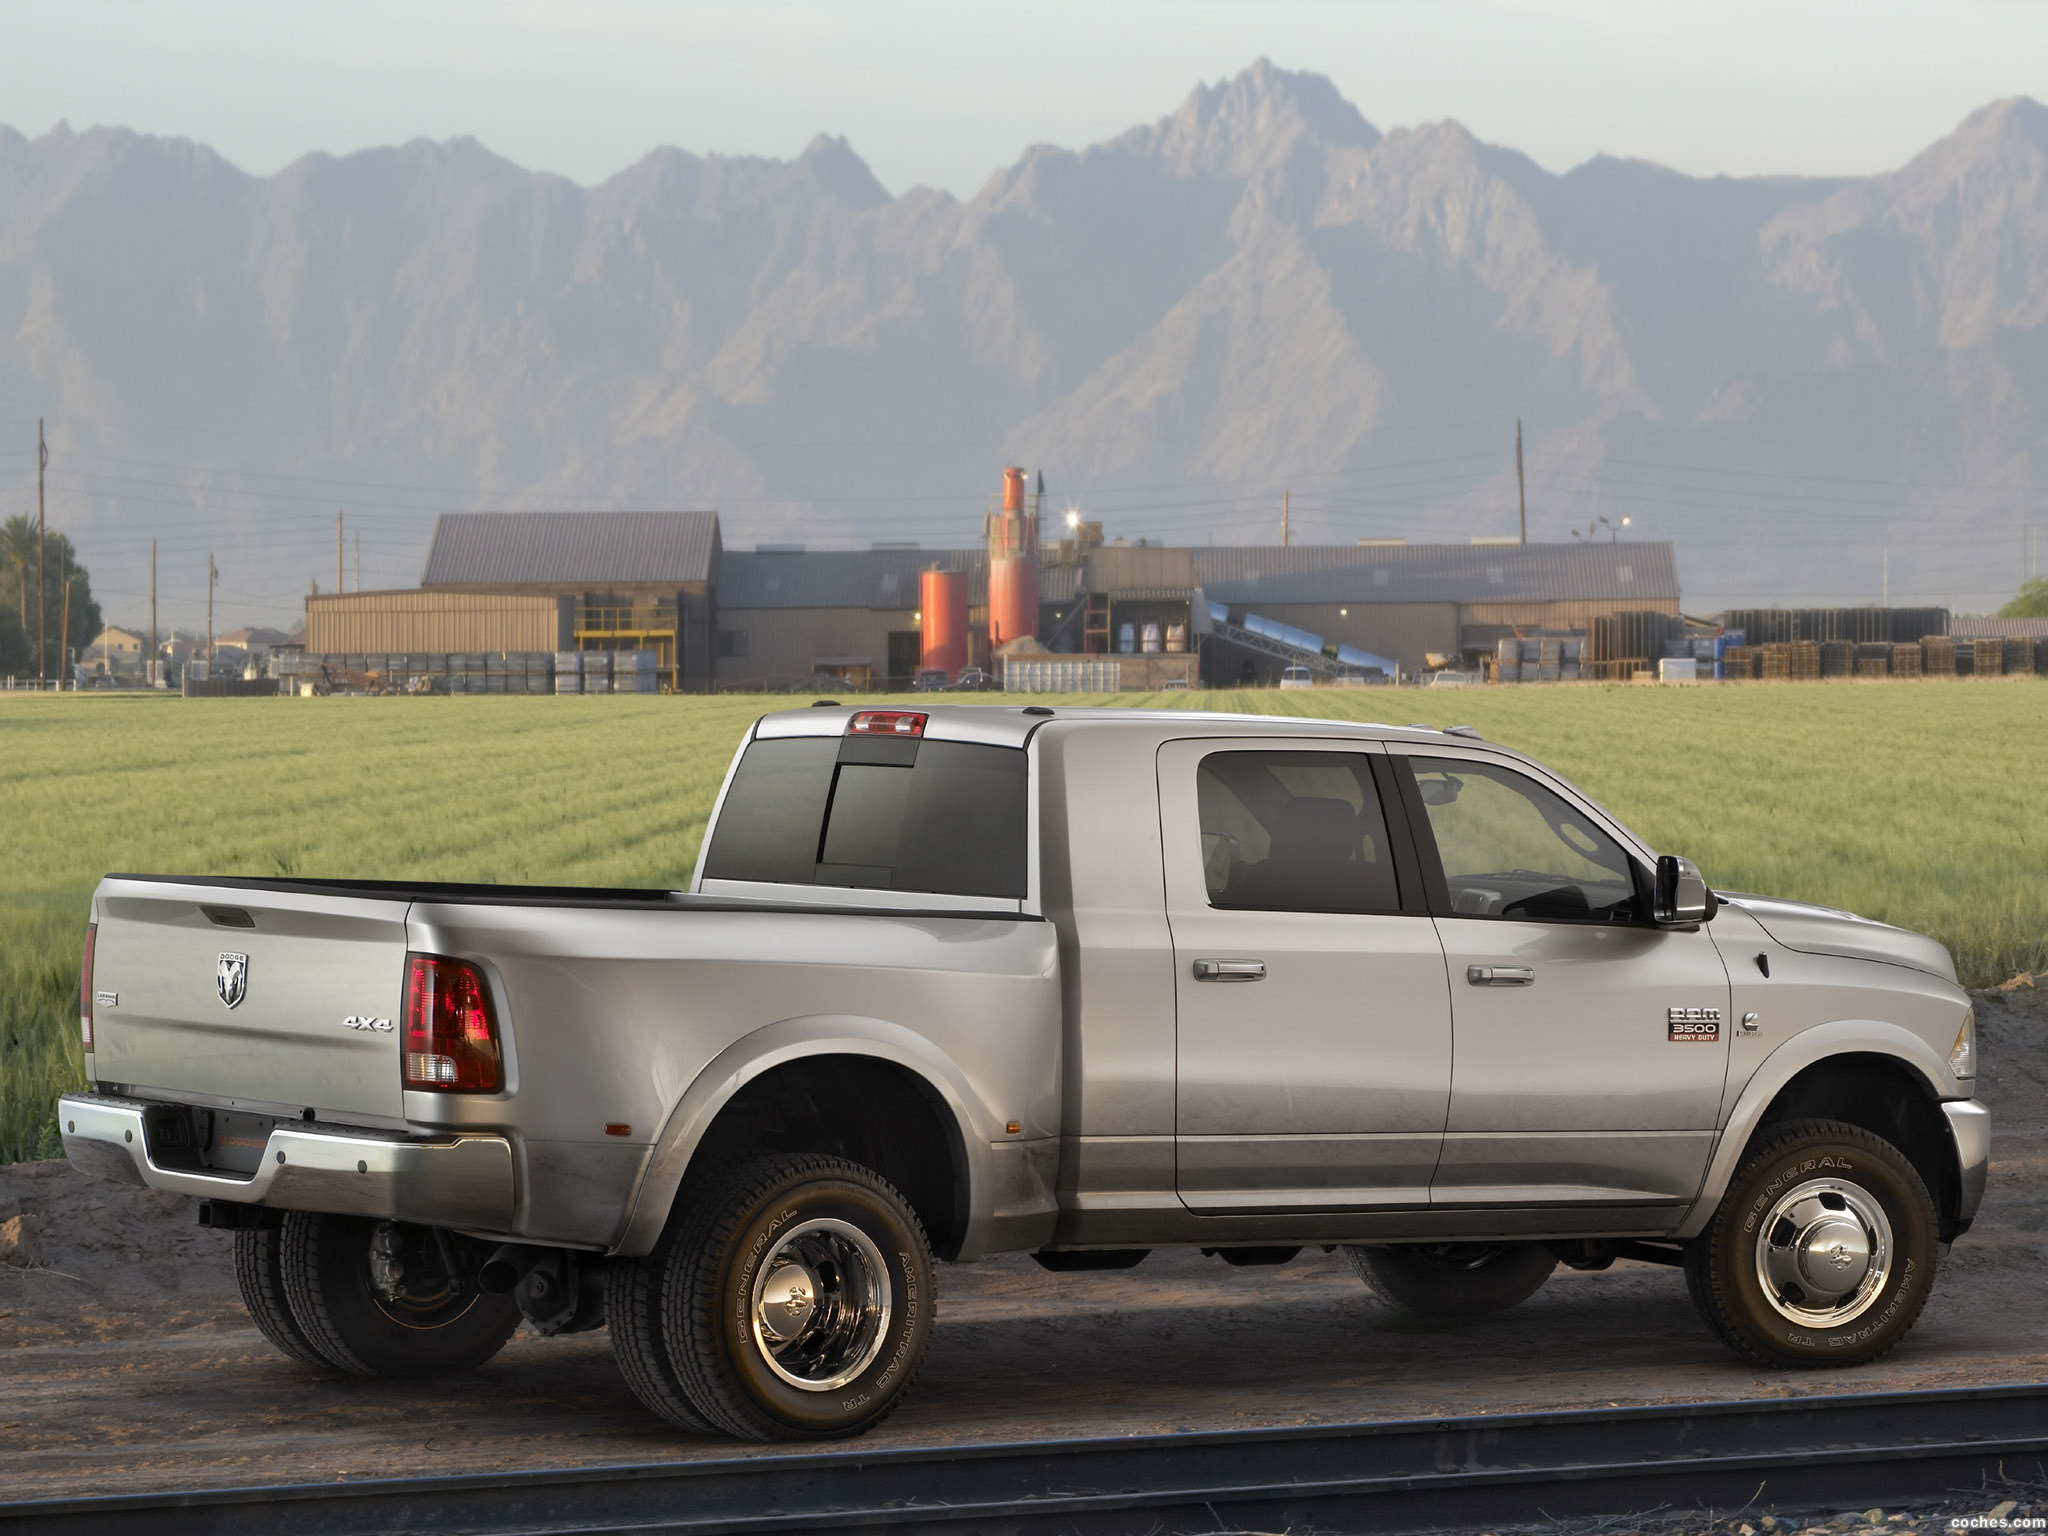 Foto 7 de Dodge RAM 3500 Heavy Duty Laramie Mega Cab 4x4 2009